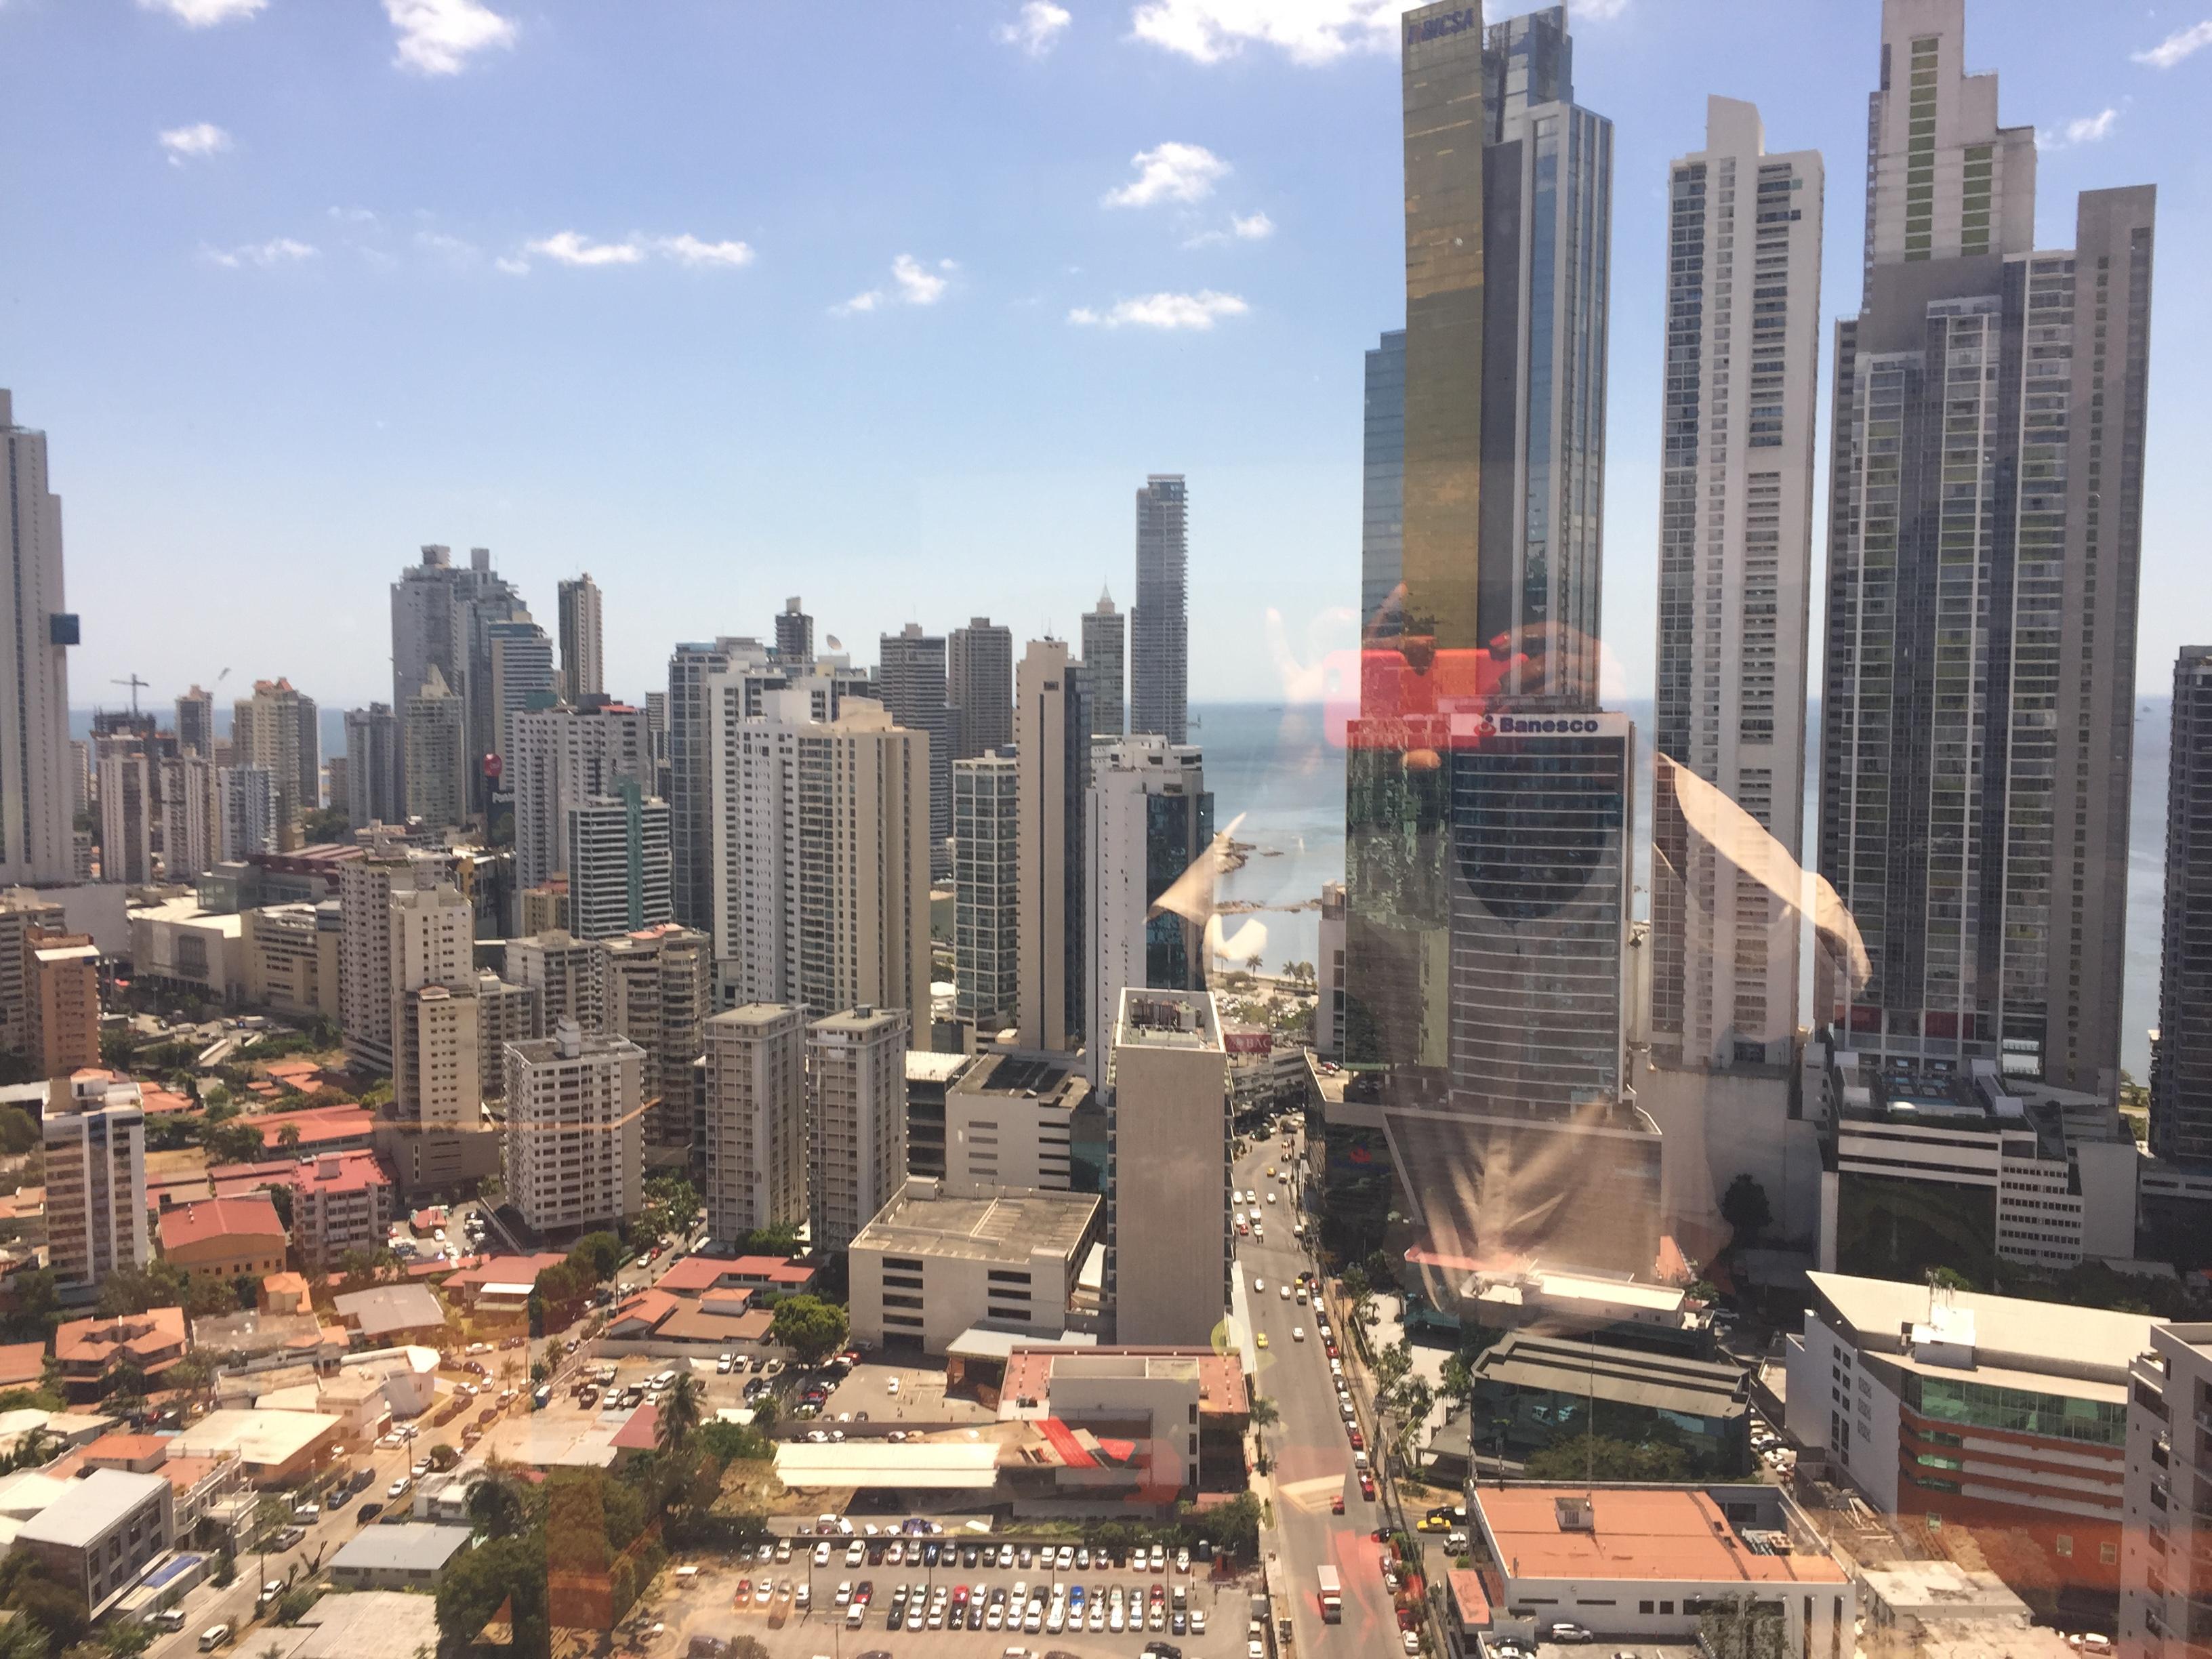 Visit of Bernard Gruppe in Panama